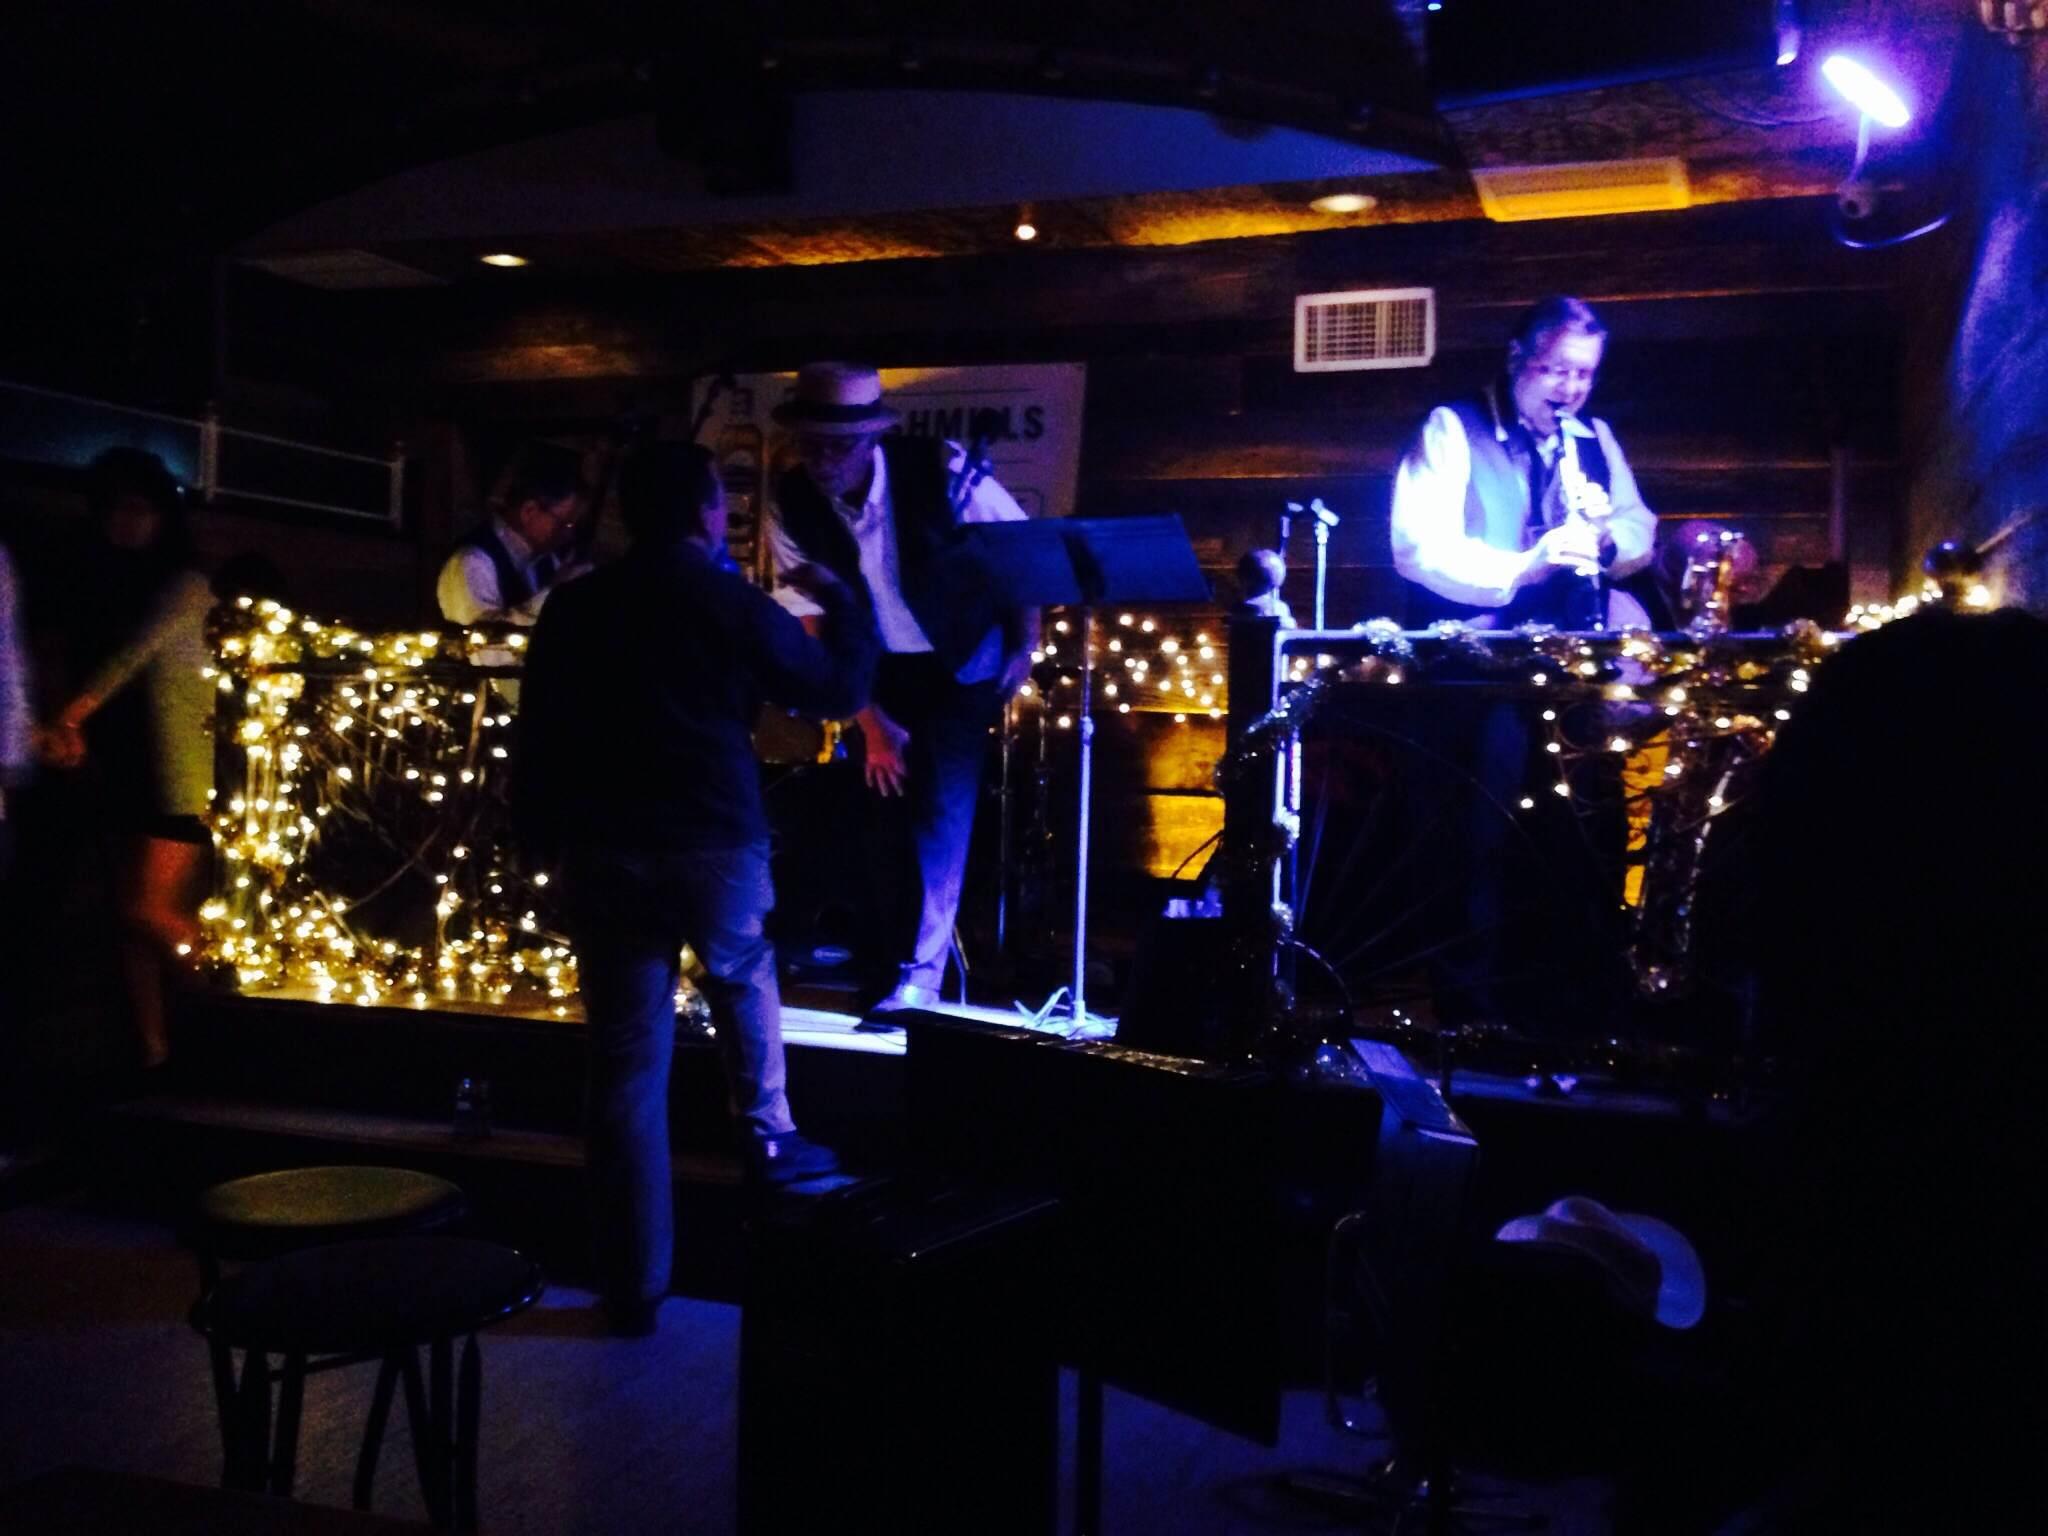 6 - Dixieland jazz at Prohibition